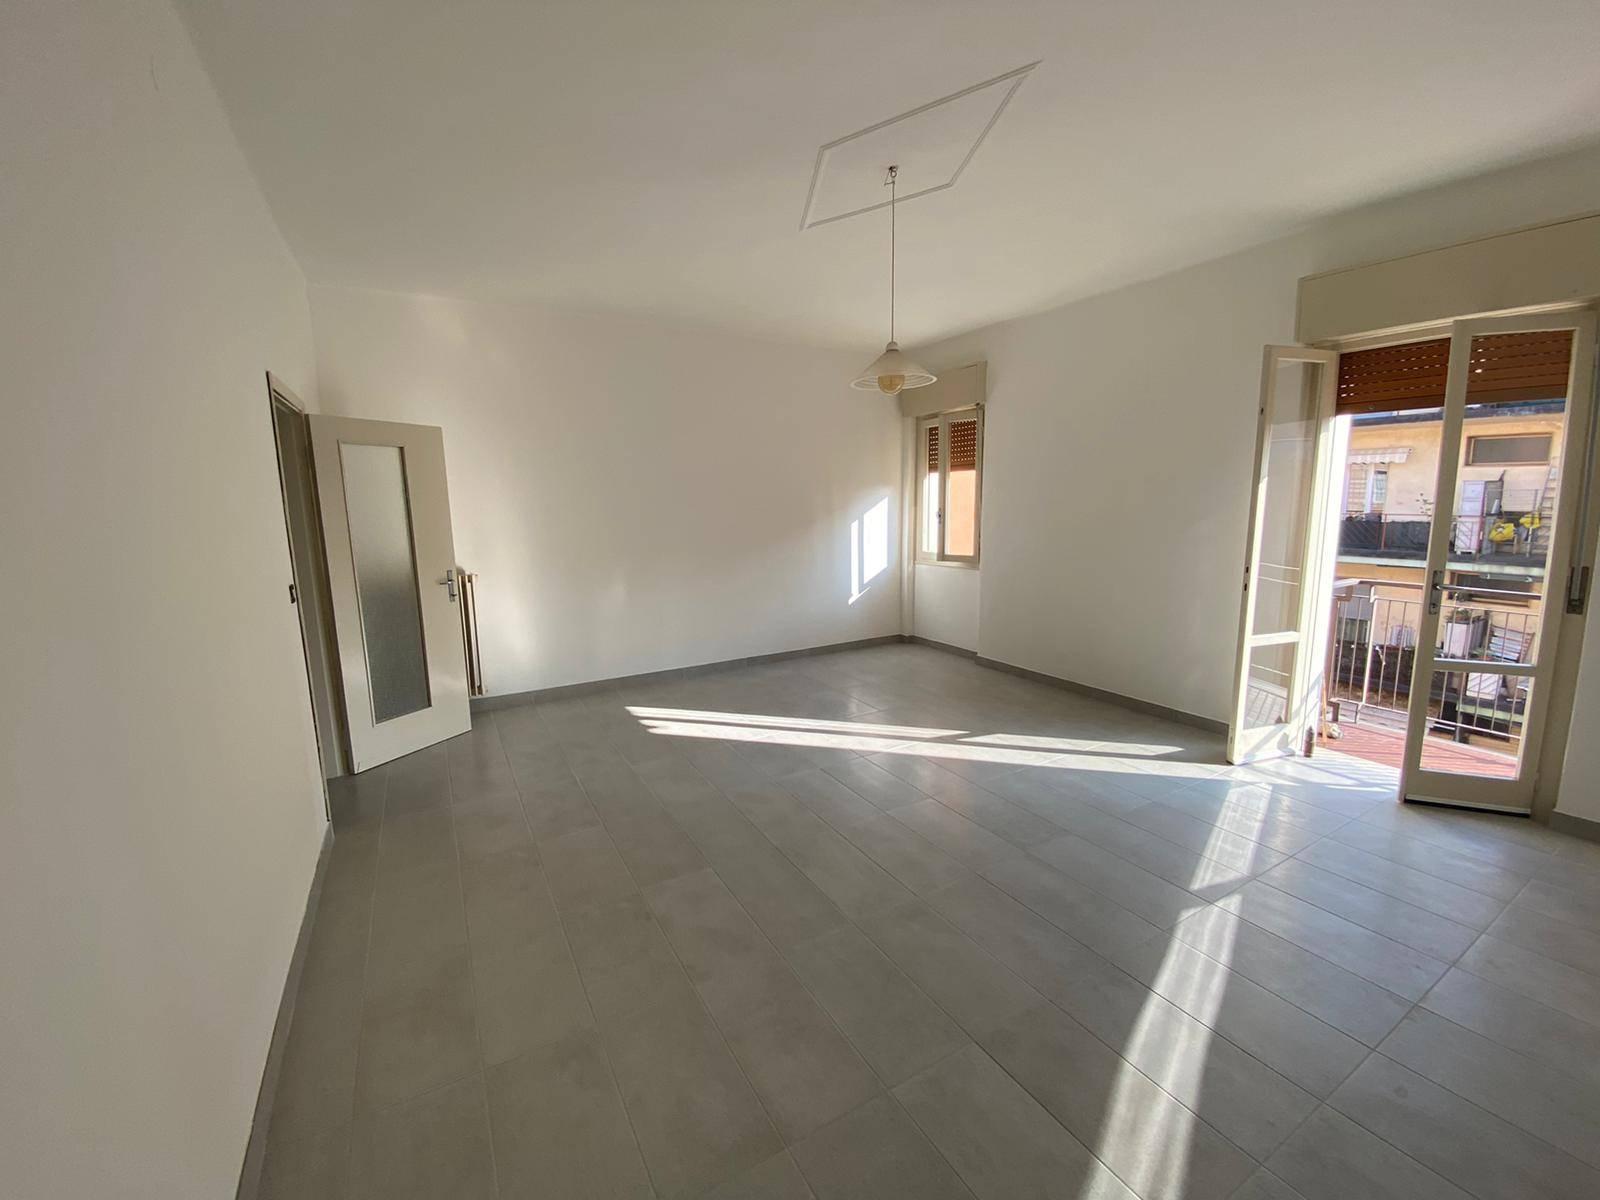 Appartamento a BRESCIA